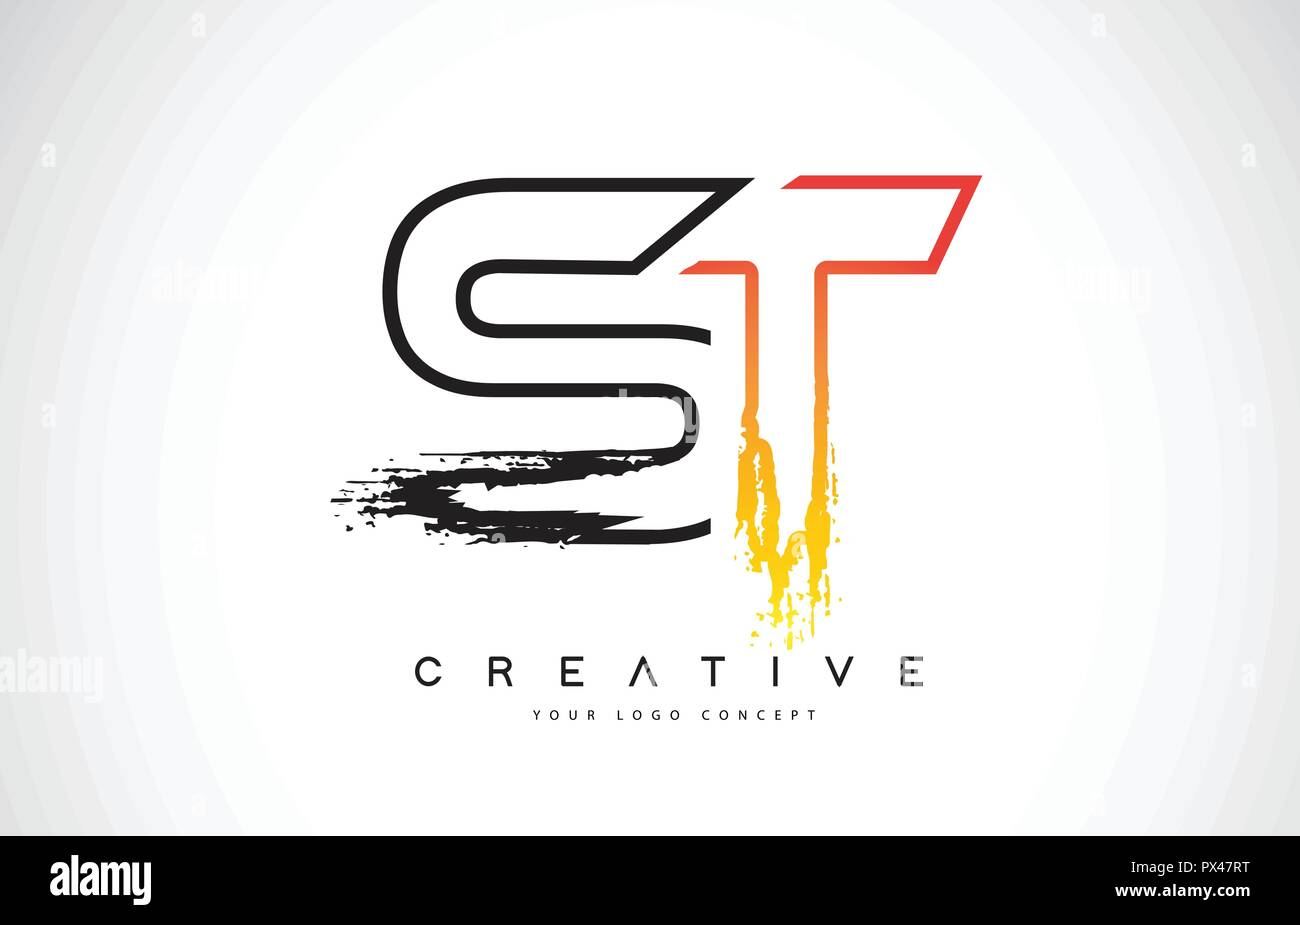 St S T Creative Modern Logo Design Vetor With Orange And